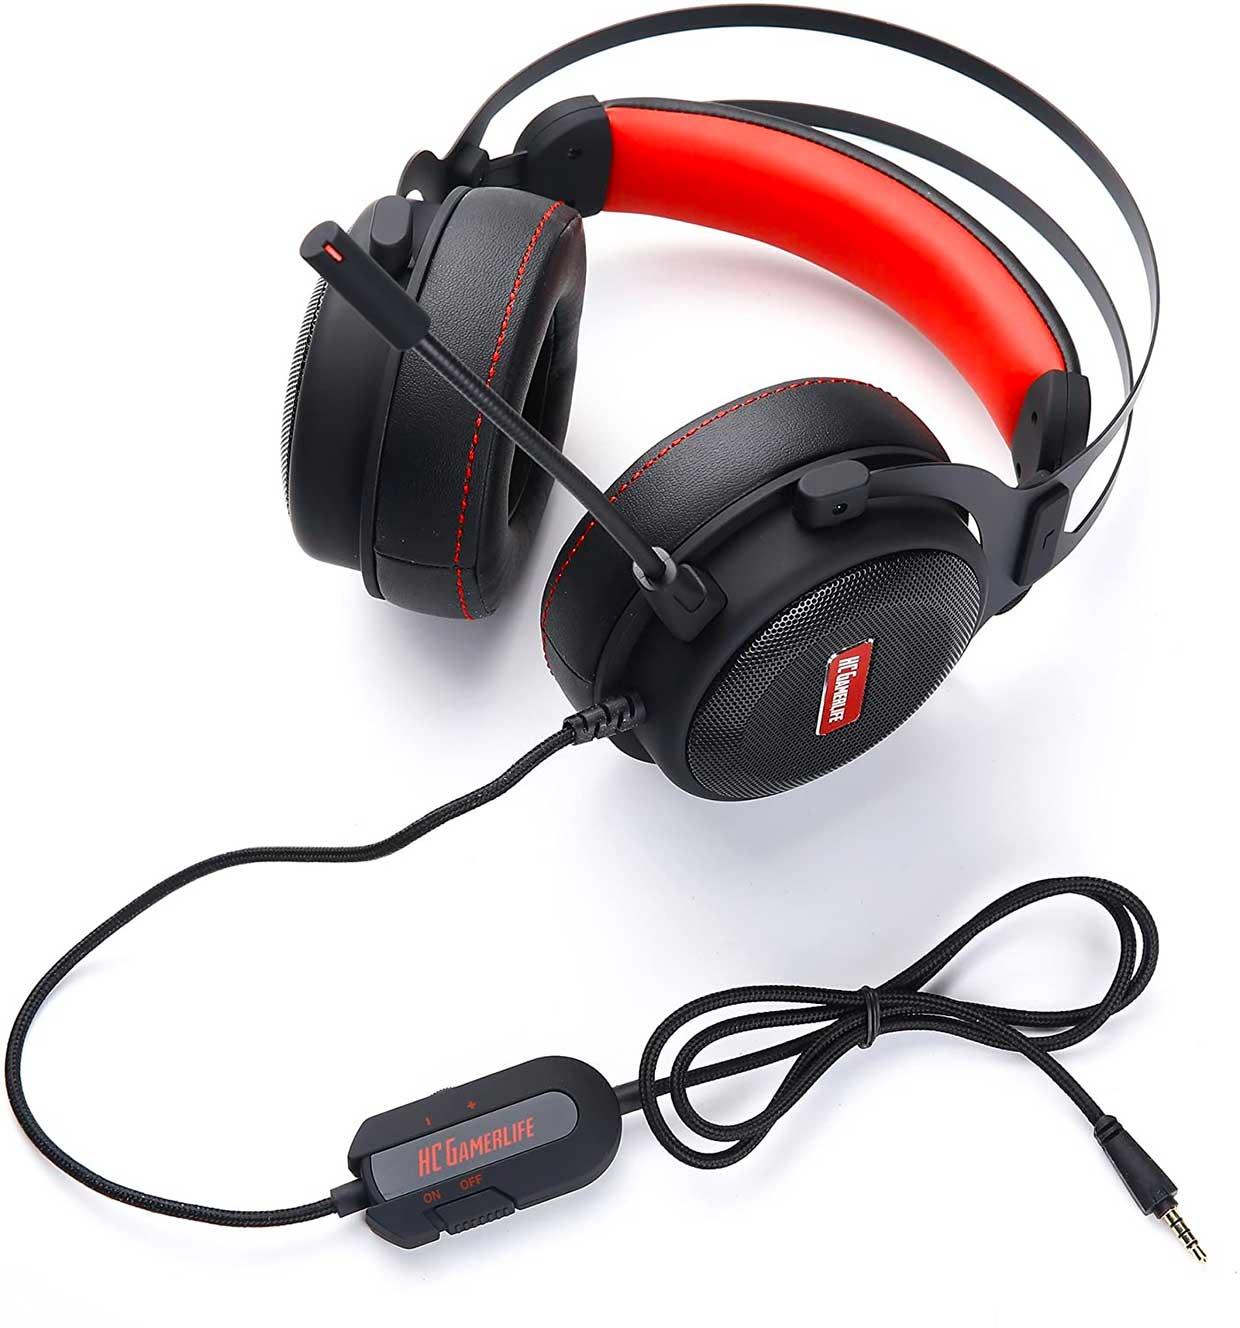 HCG1 Pro Gaming Headset